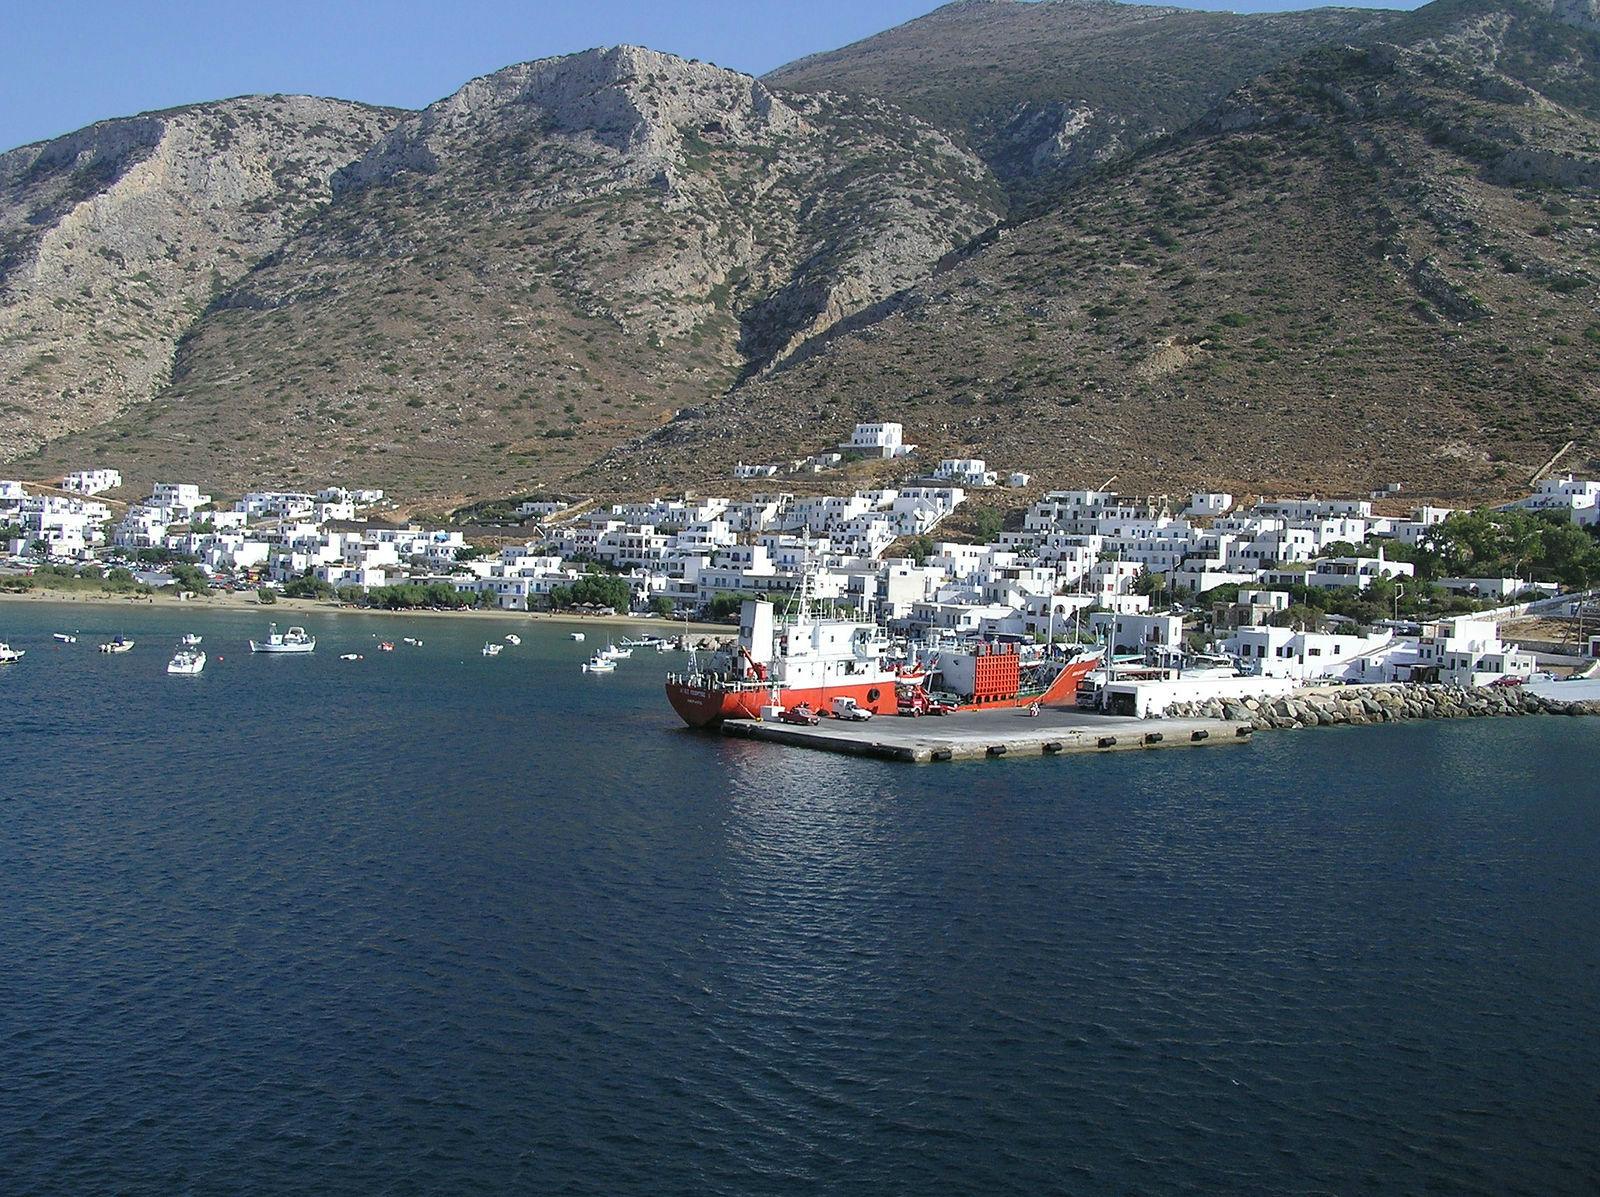 Sifnos Port www.njcharters.com #DestinationConfidential